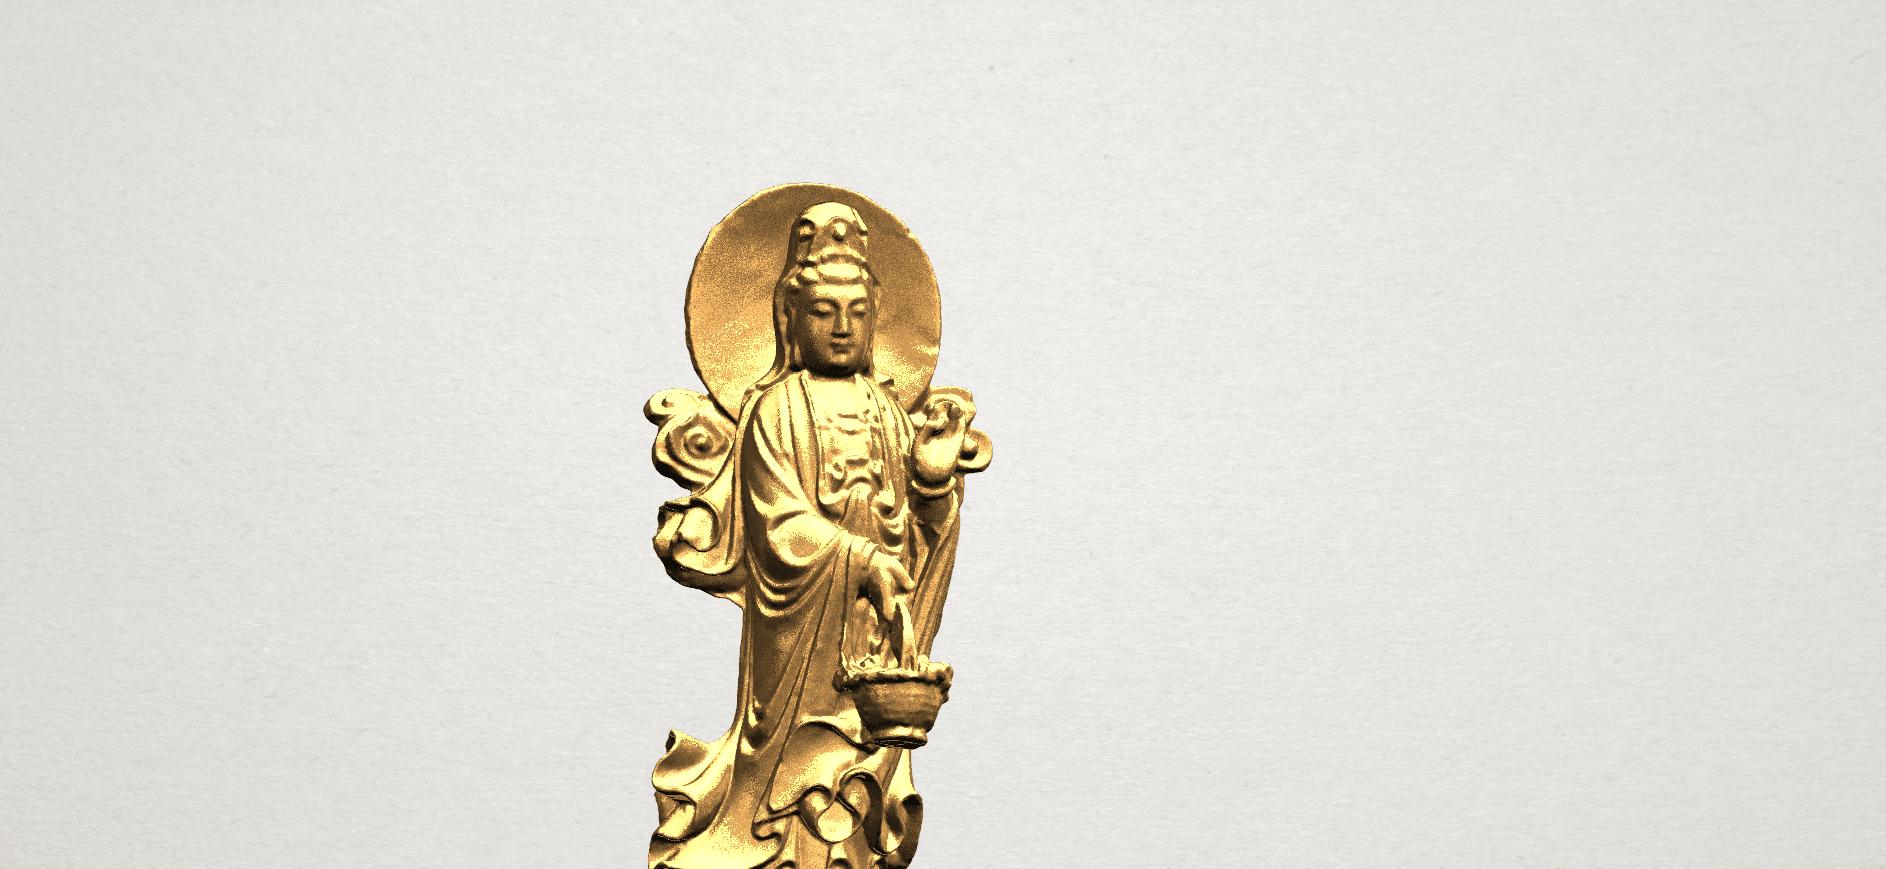 Avalokitesvara Buddha  (with fish) (ii) A08.png Download free STL file Avalokitesvara Bodhisattva (with fish) 02 • 3D printer template, GeorgesNikkei